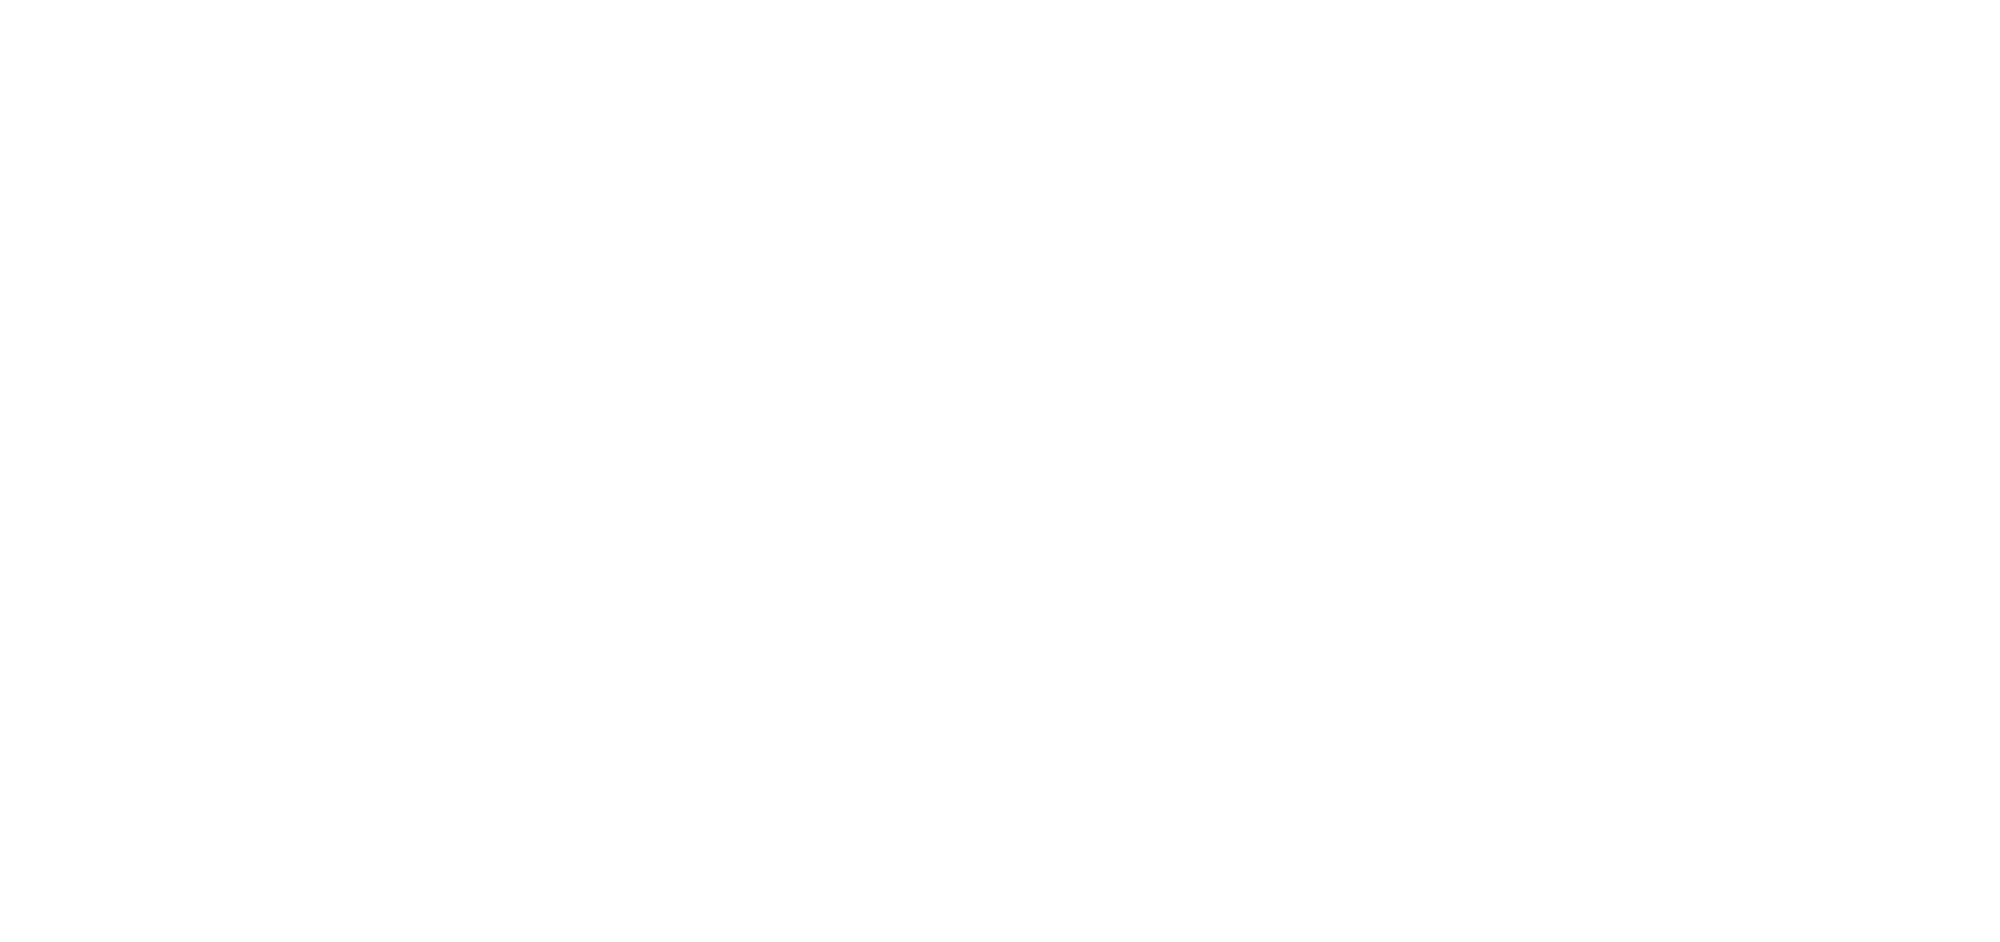 Jelle 't Hart